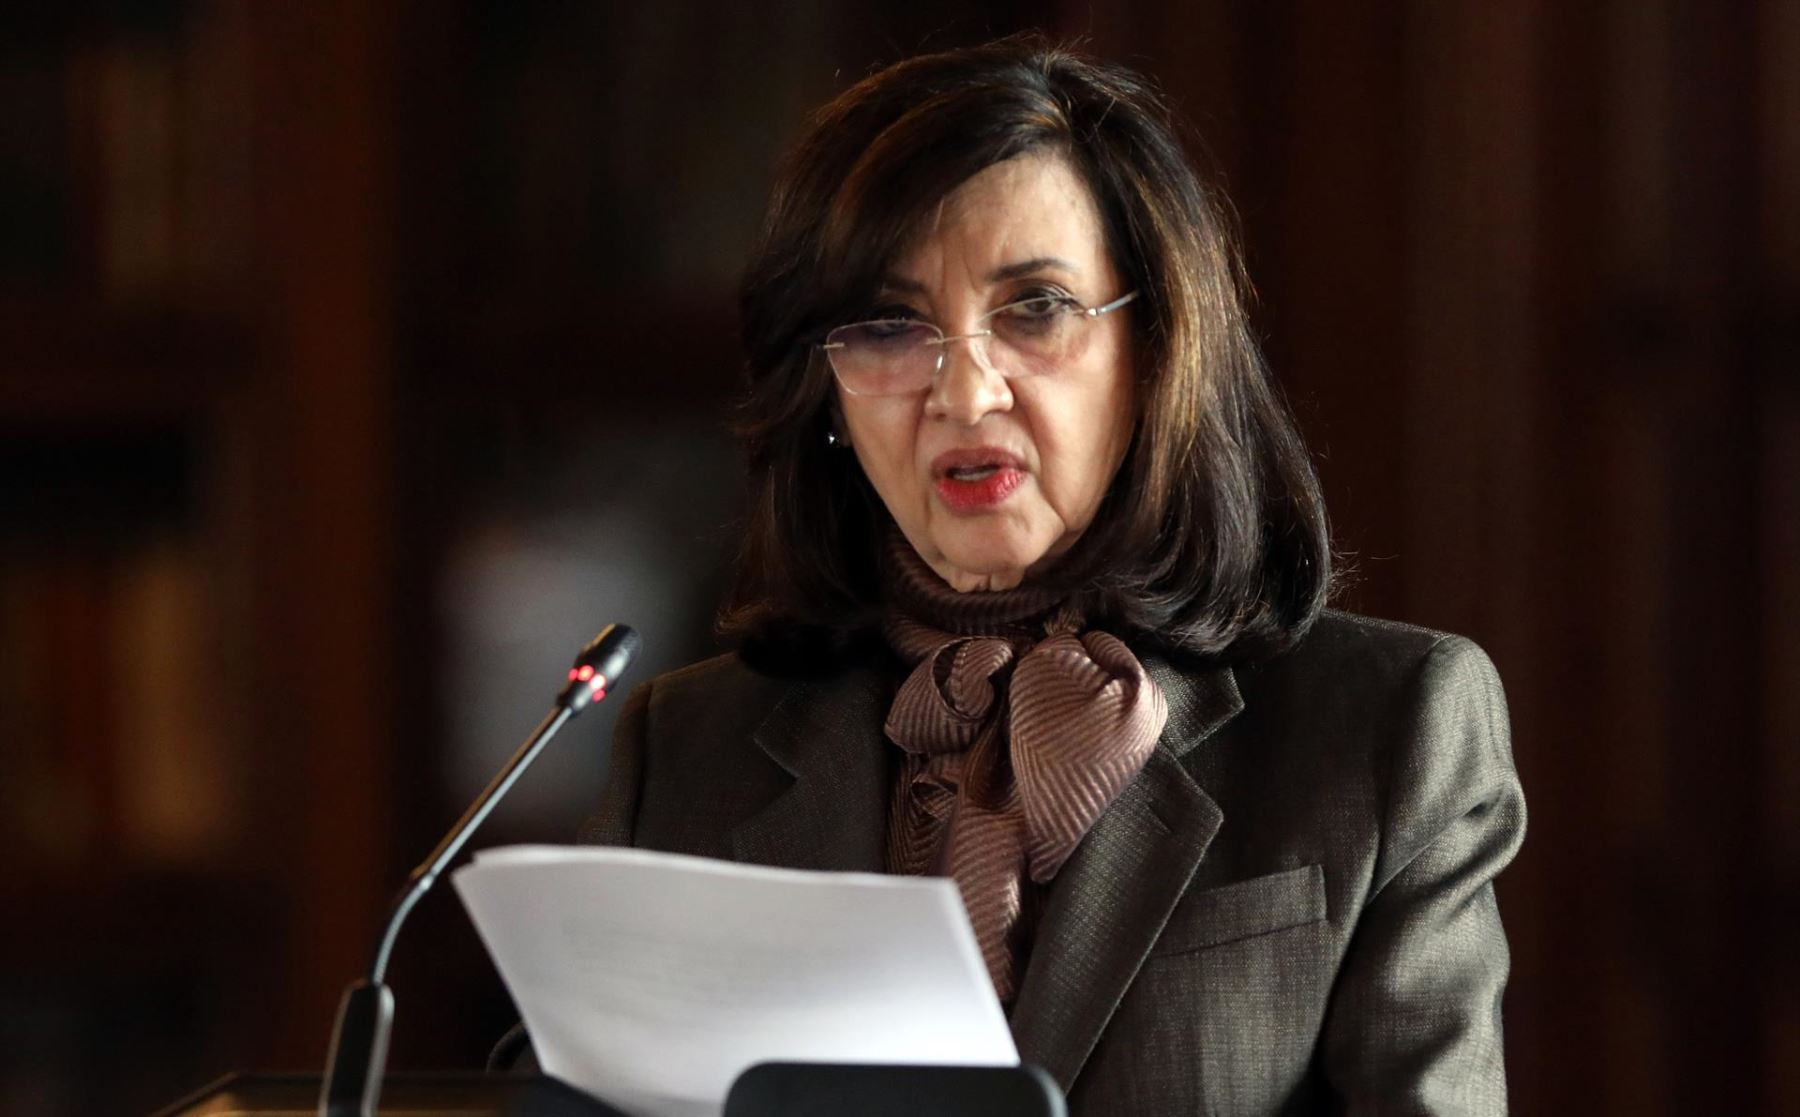 Claudia Blum, canciller de Colombia, presentó renuncia irrevocable